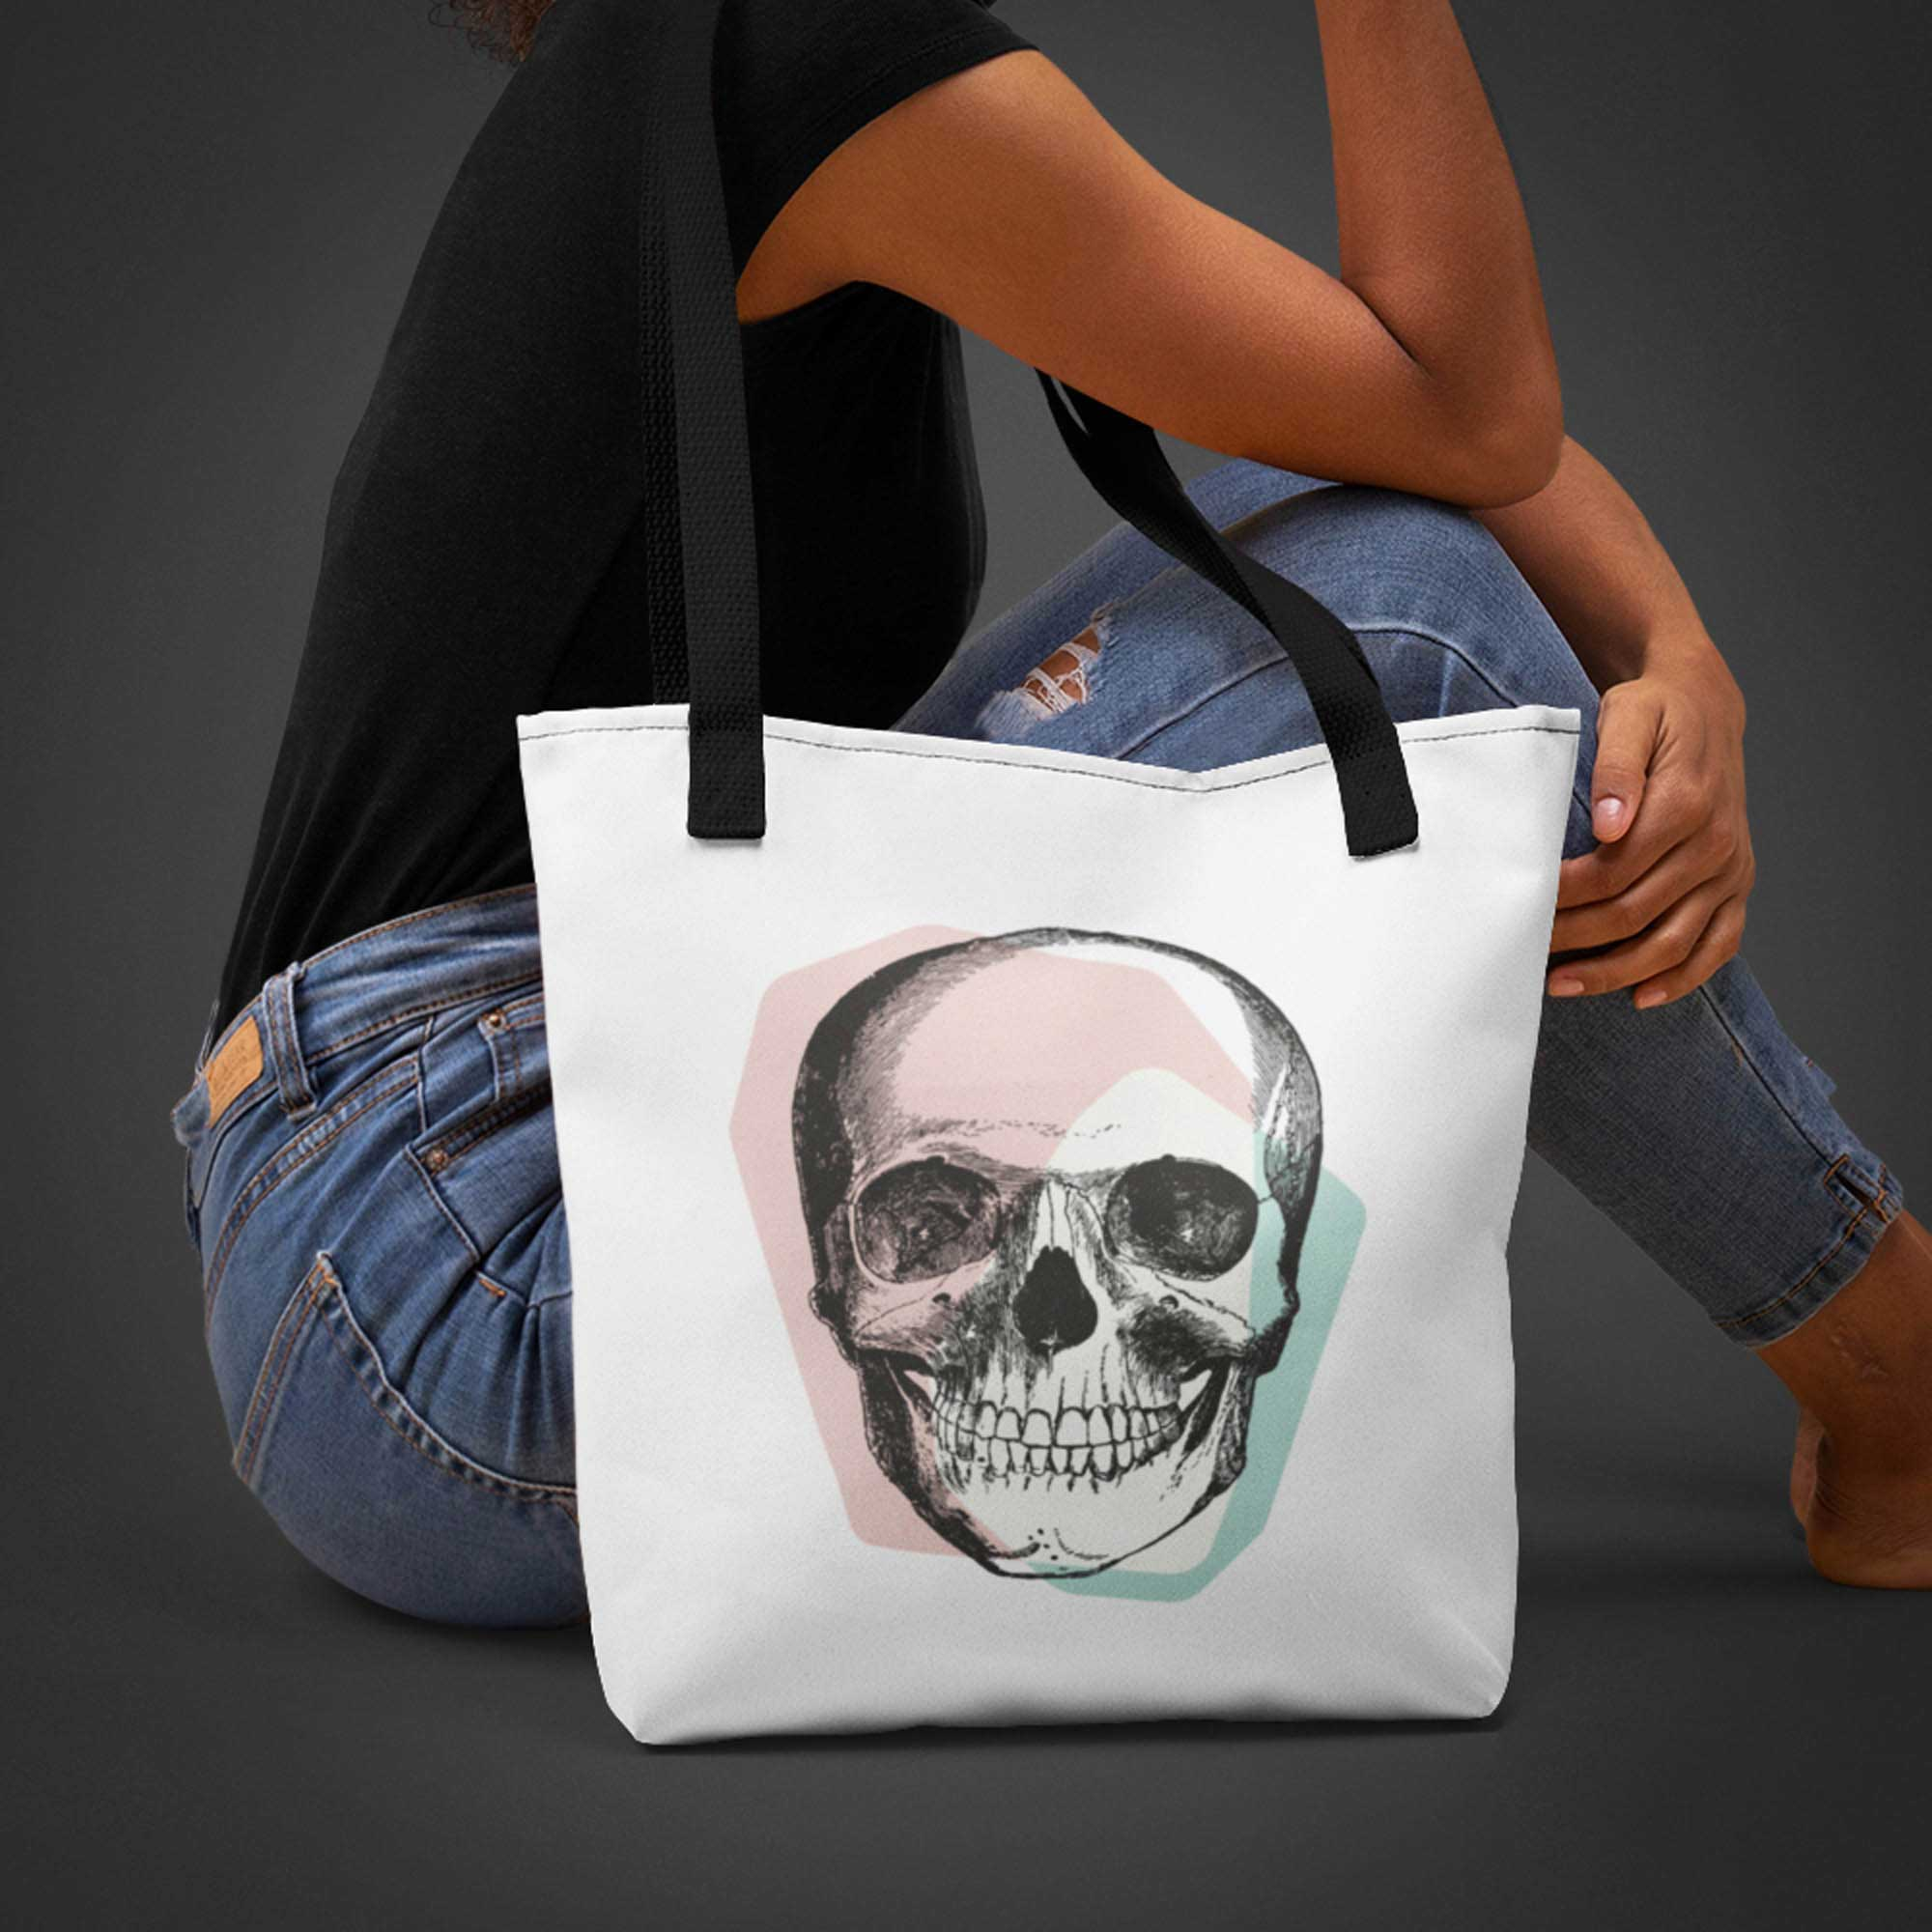 Skull Tote Bag. A Pastel Goth fashion accessory.